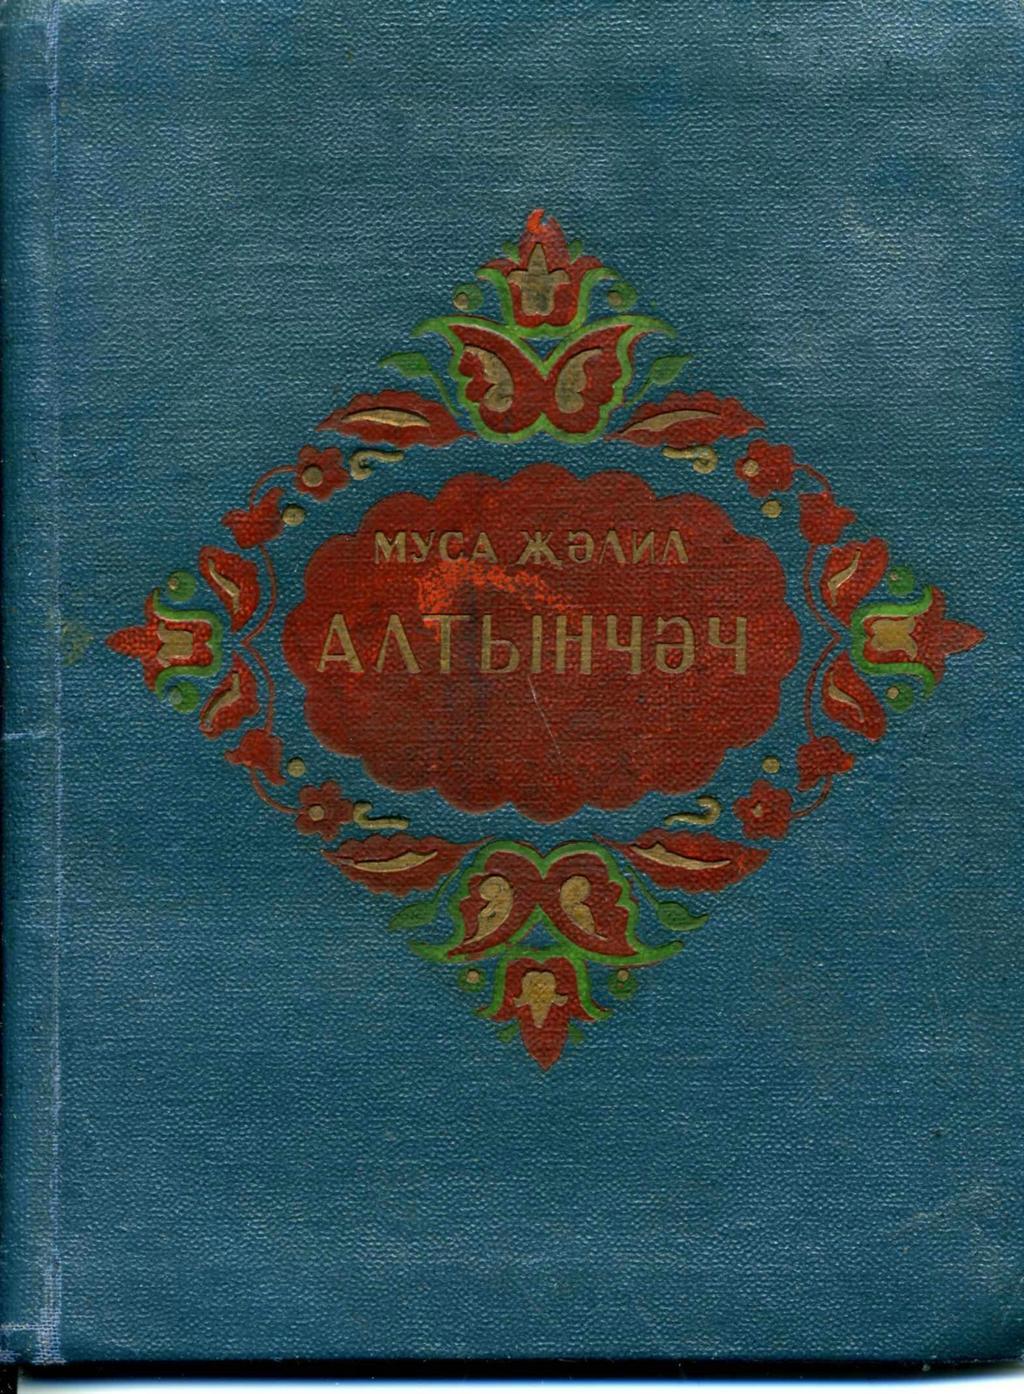 М.Джалиль.  Либретто к опере «Алтынчеч». 1941 ©Tatfrontu.ru Photo Archive